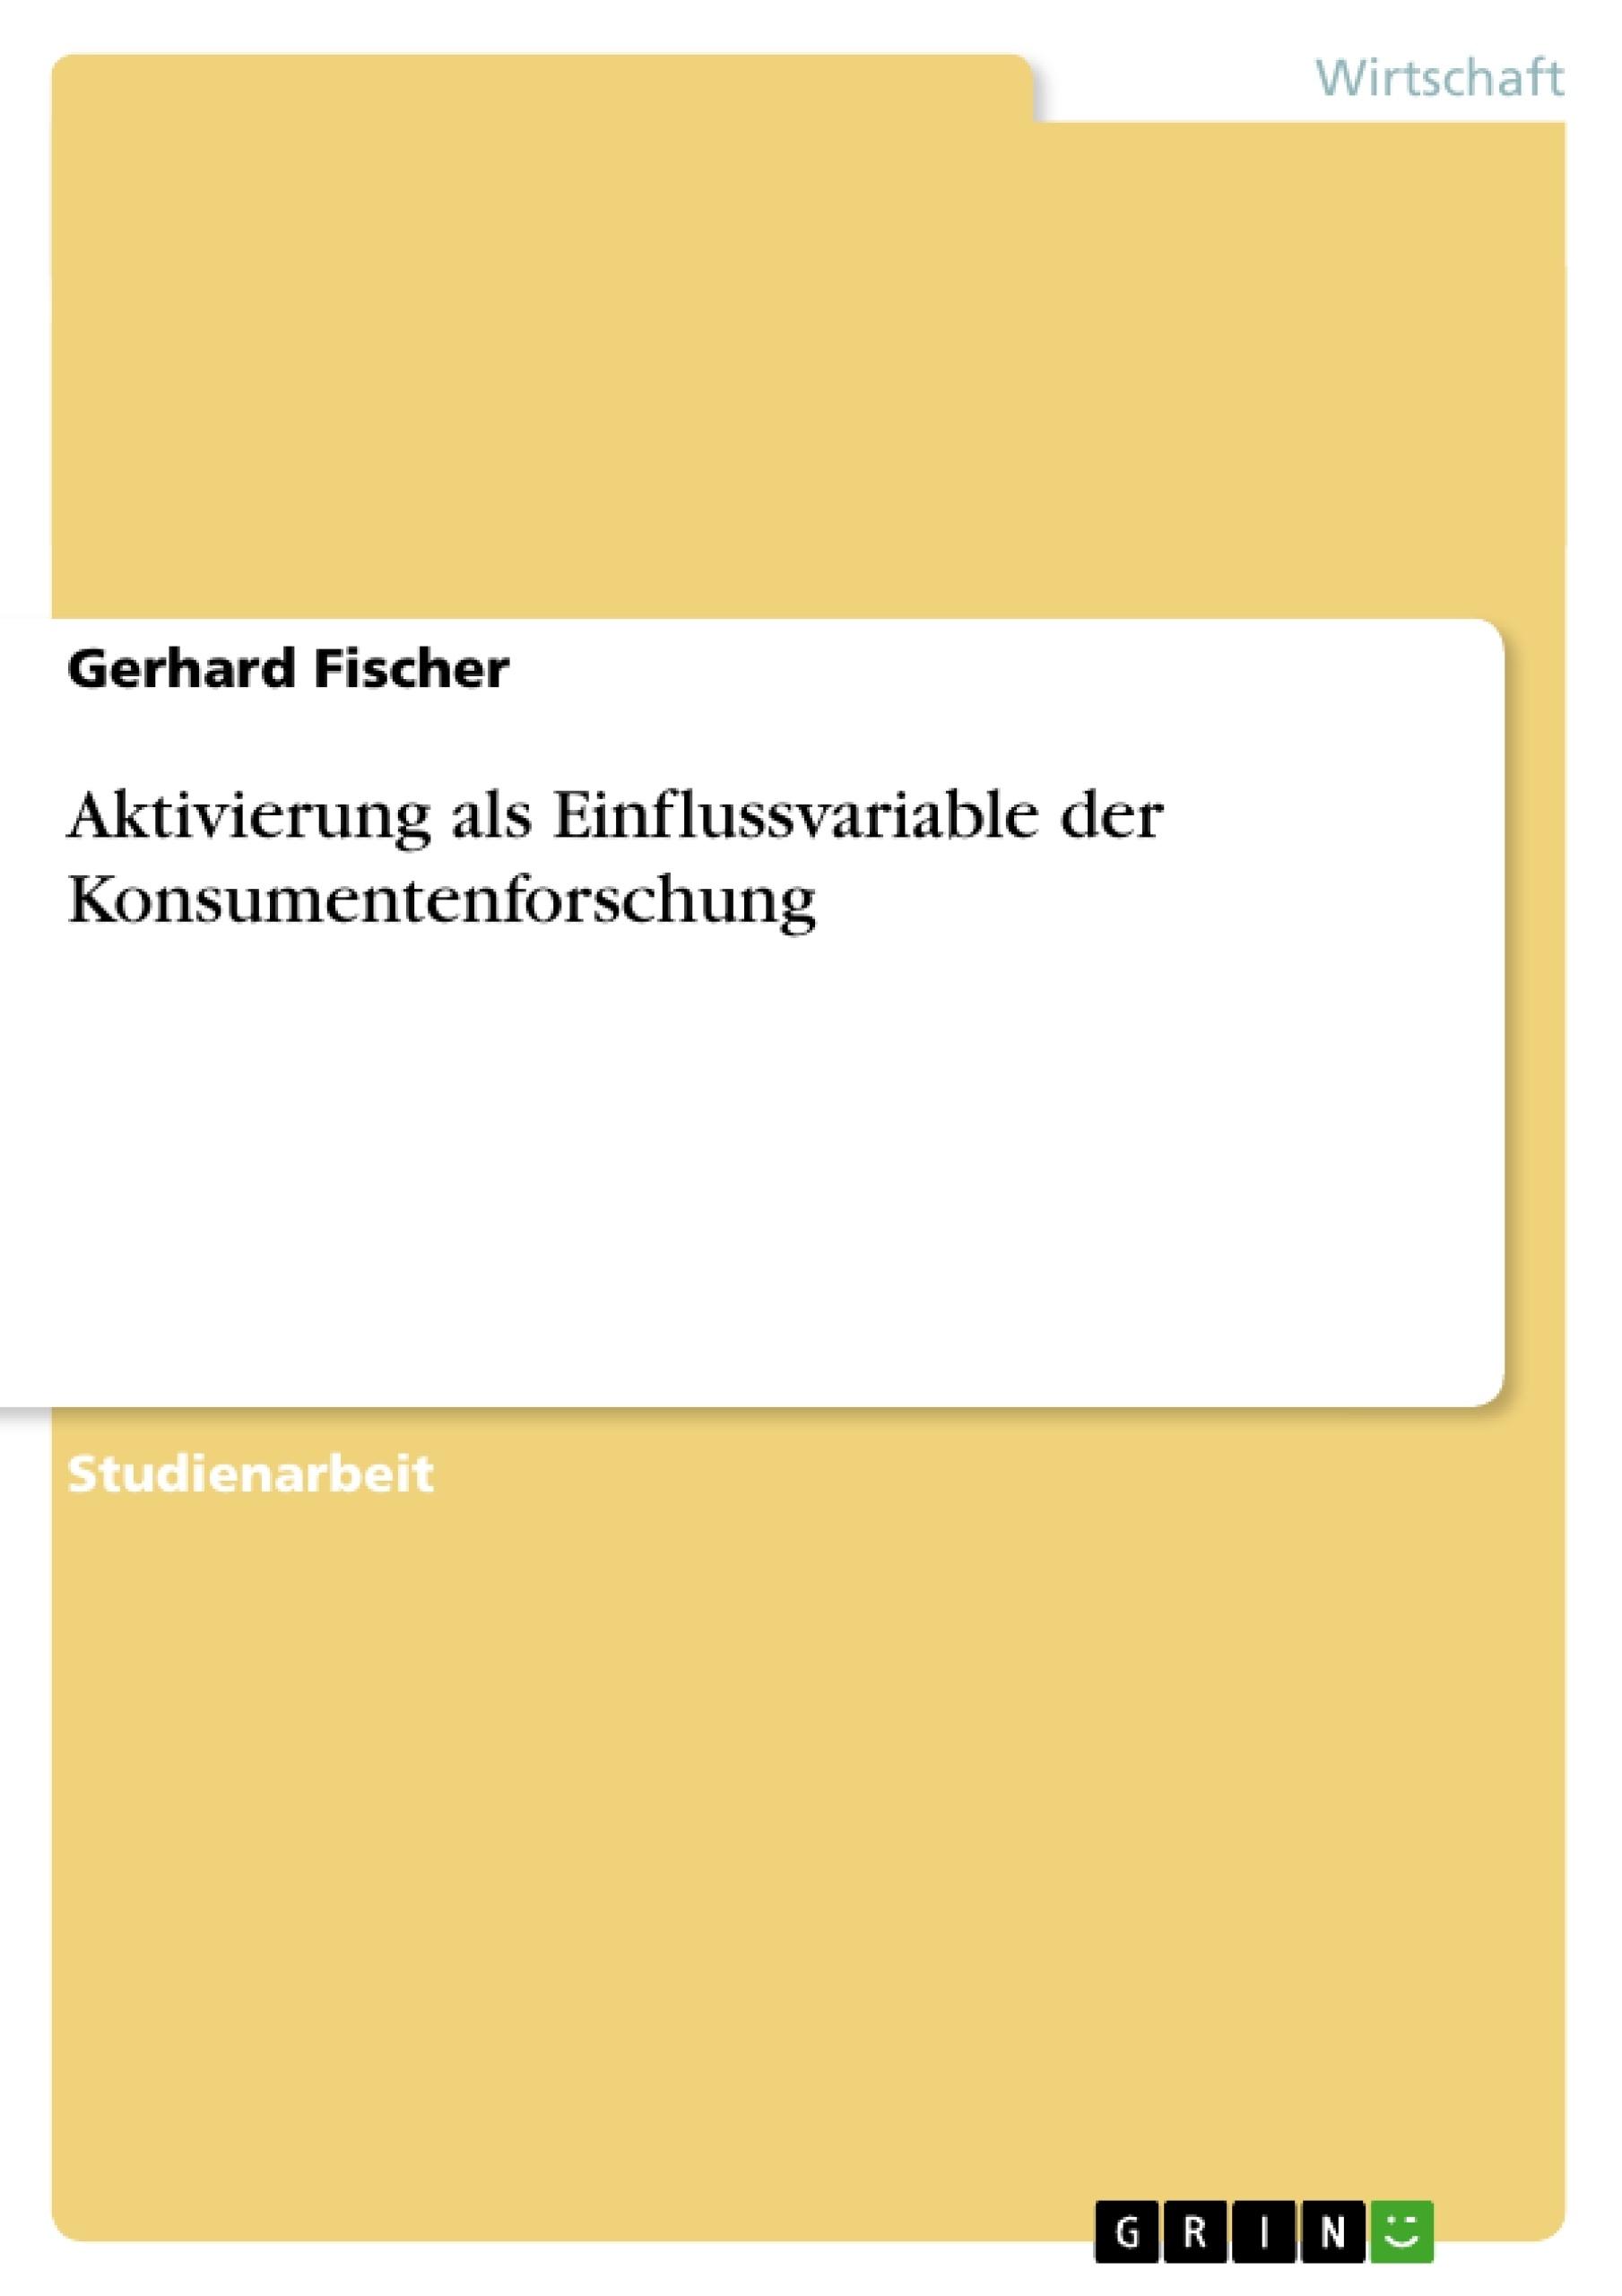 Titel: Aktivierung als Einflussvariable der Konsumentenforschung